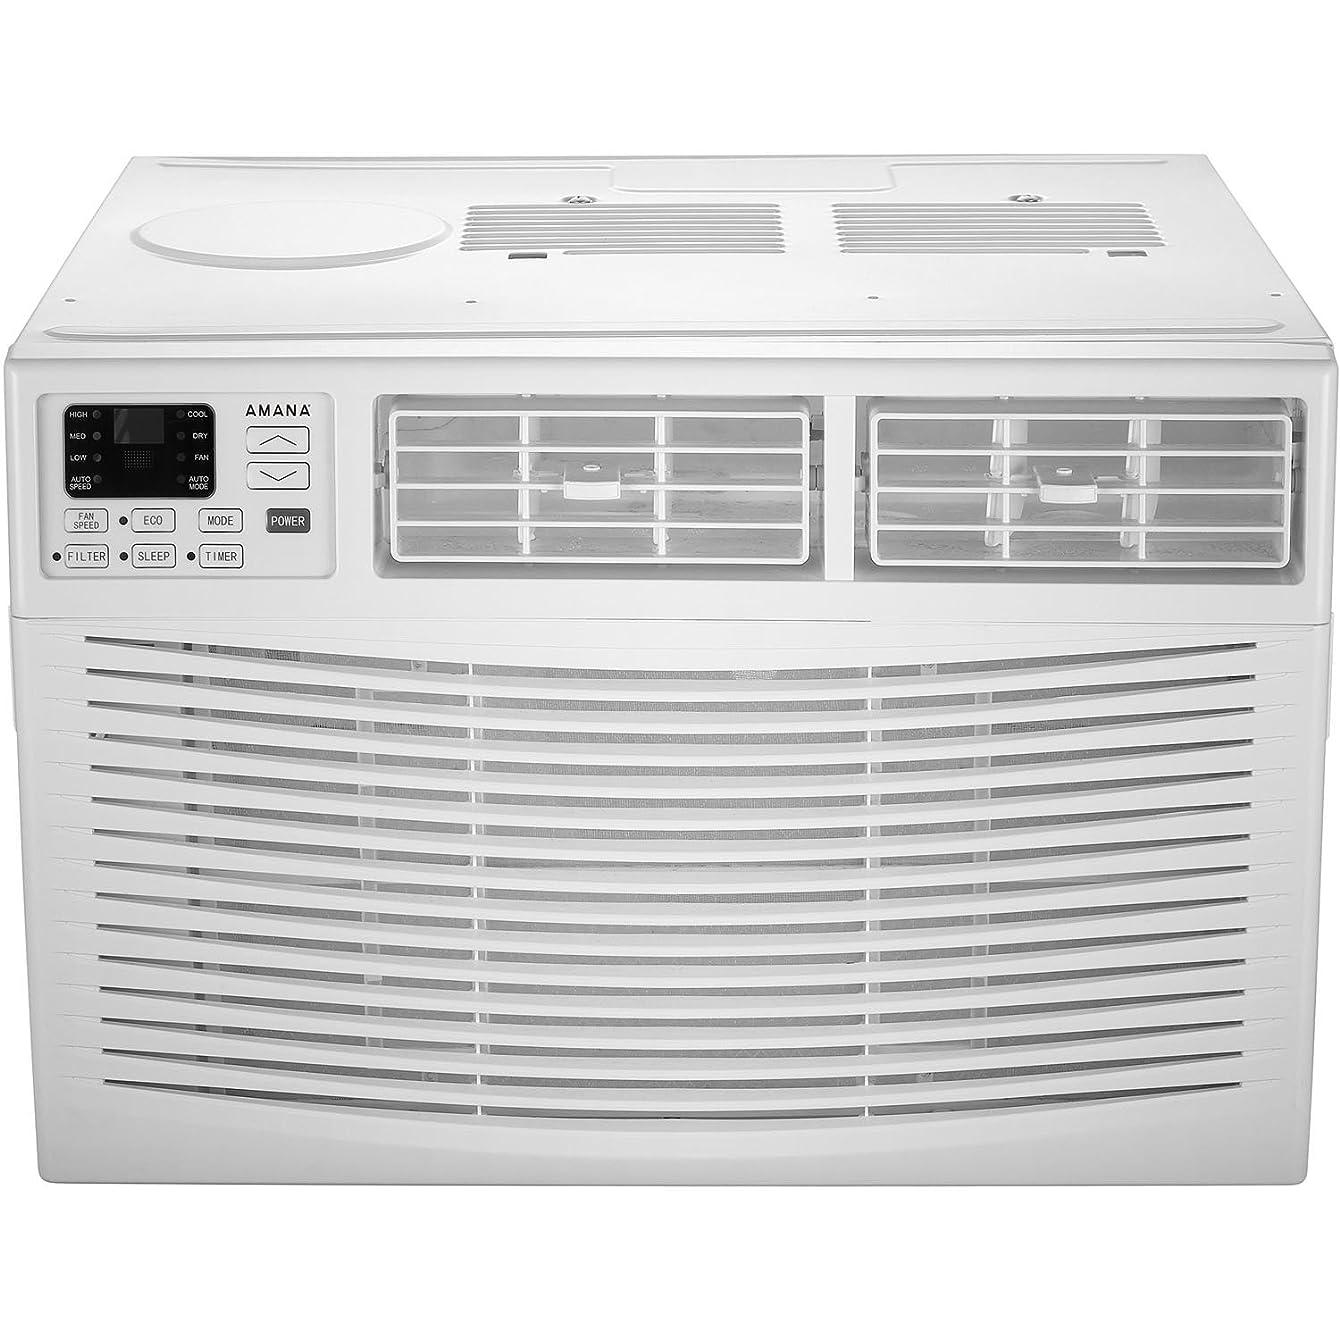 Amana 24,000 BTU 230V Window-Mounted Air Conditioner with Remote Control, White ycfckgwedhpvw01